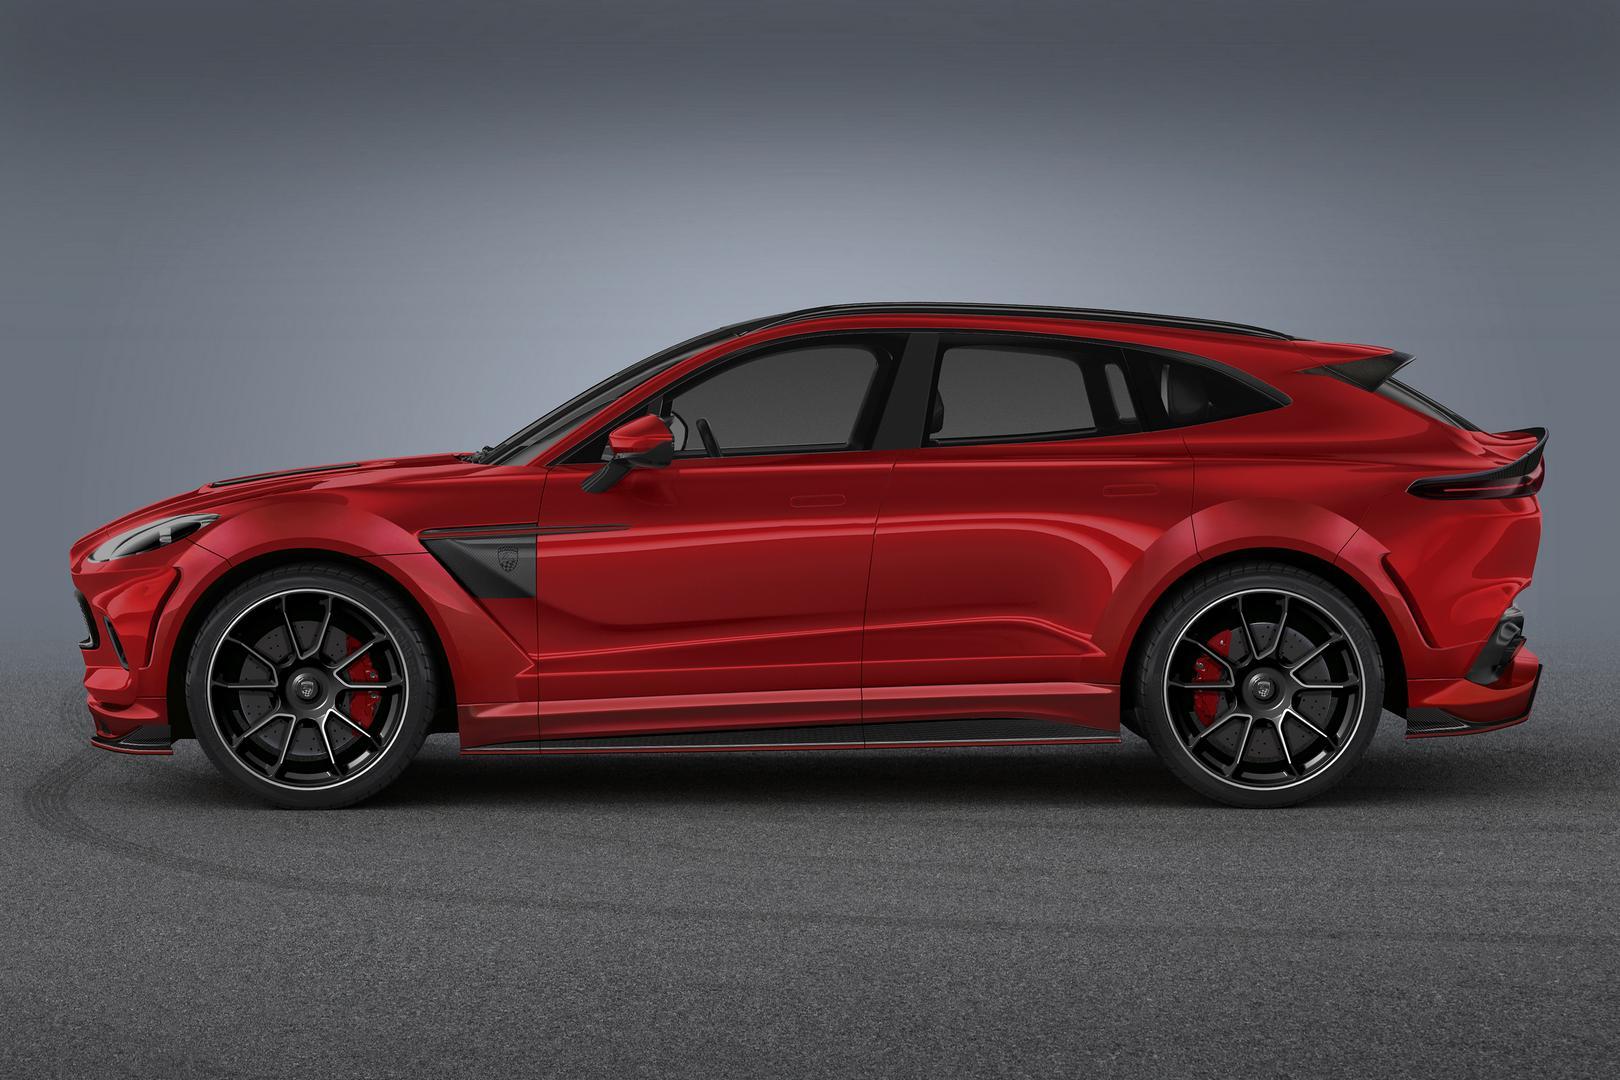 Red Aston Martin DBX